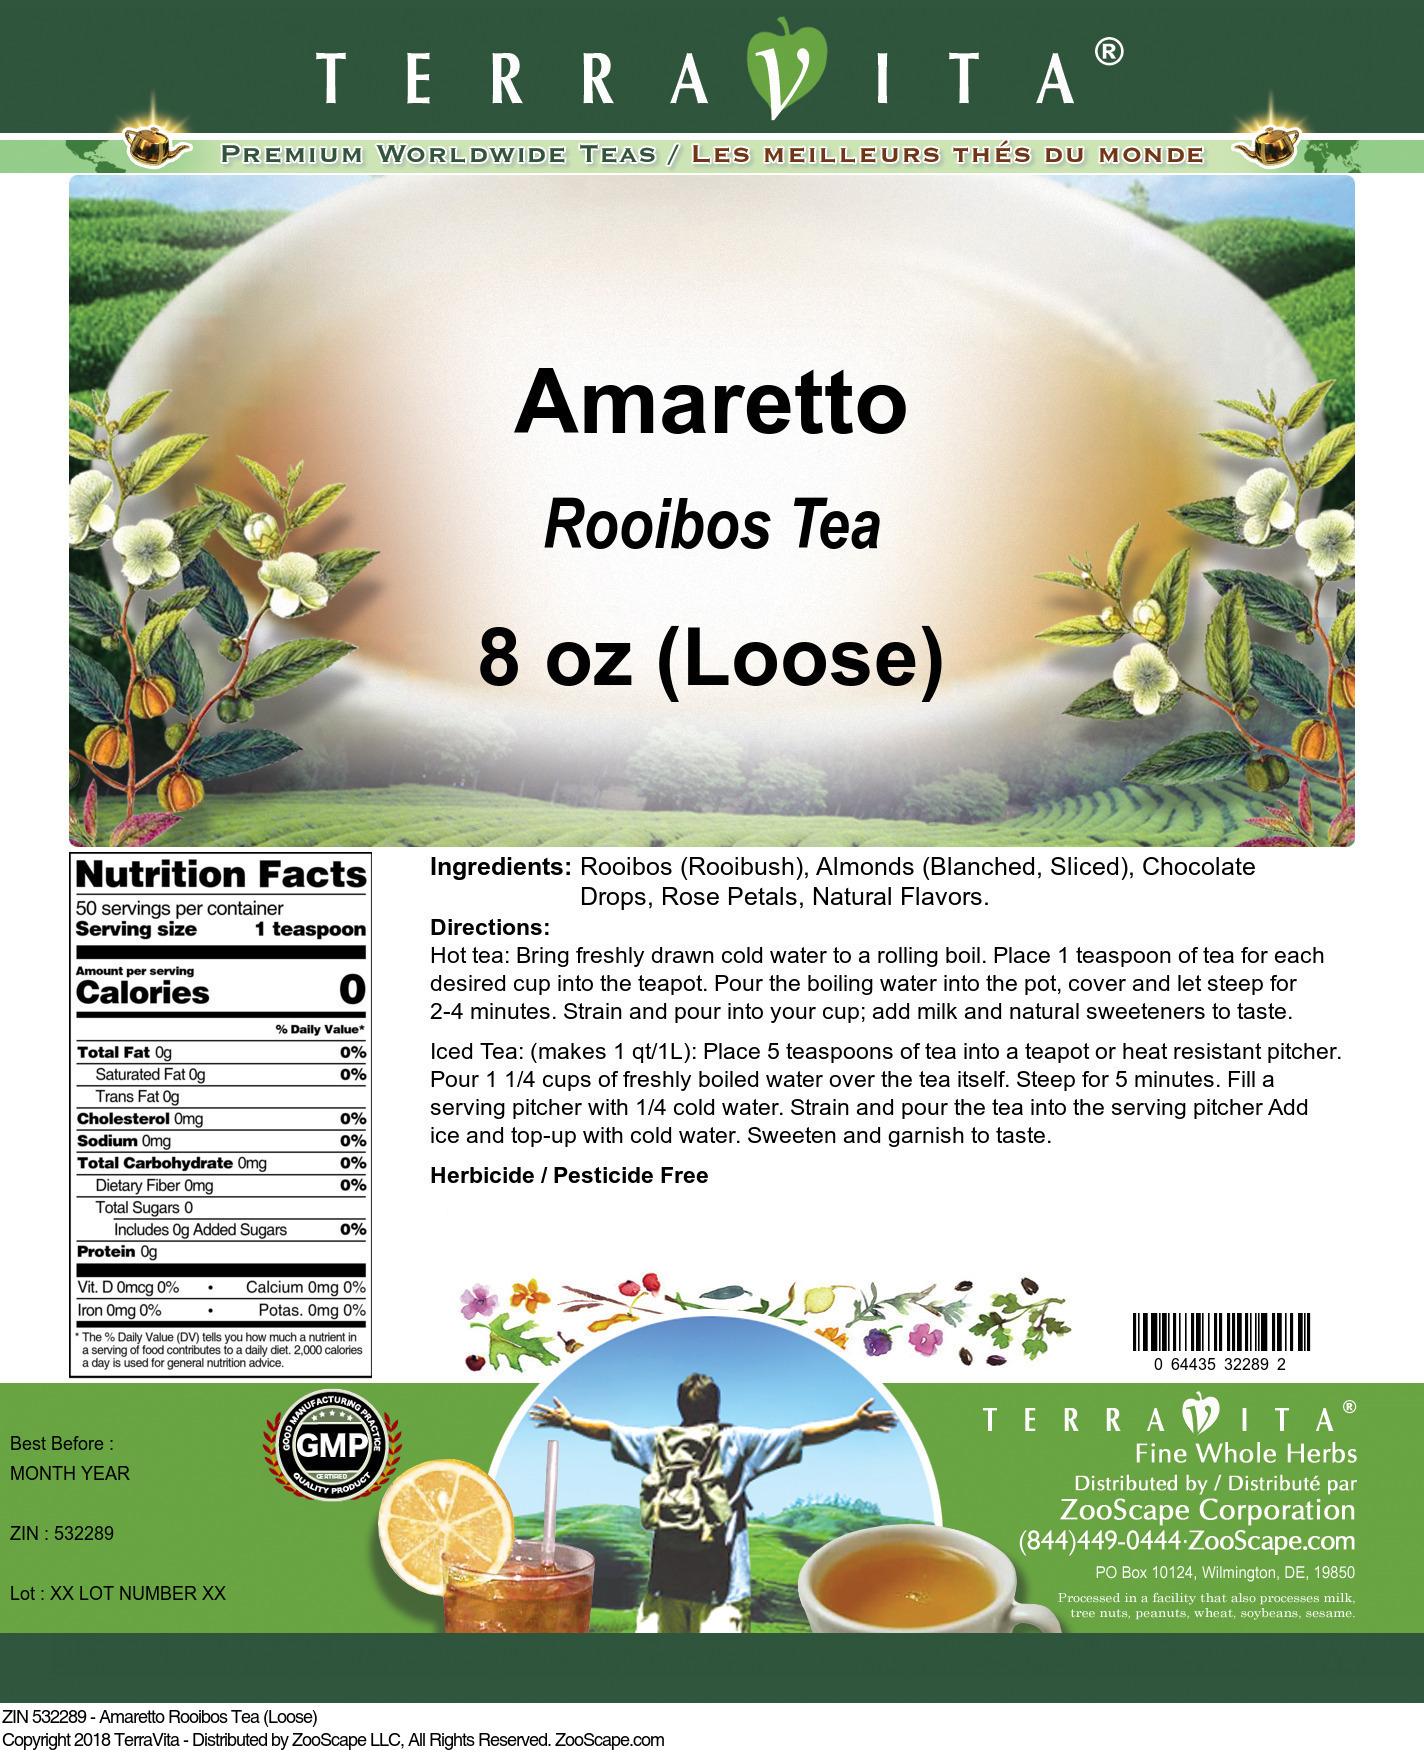 Amaretto Rooibos Tea (Loose)